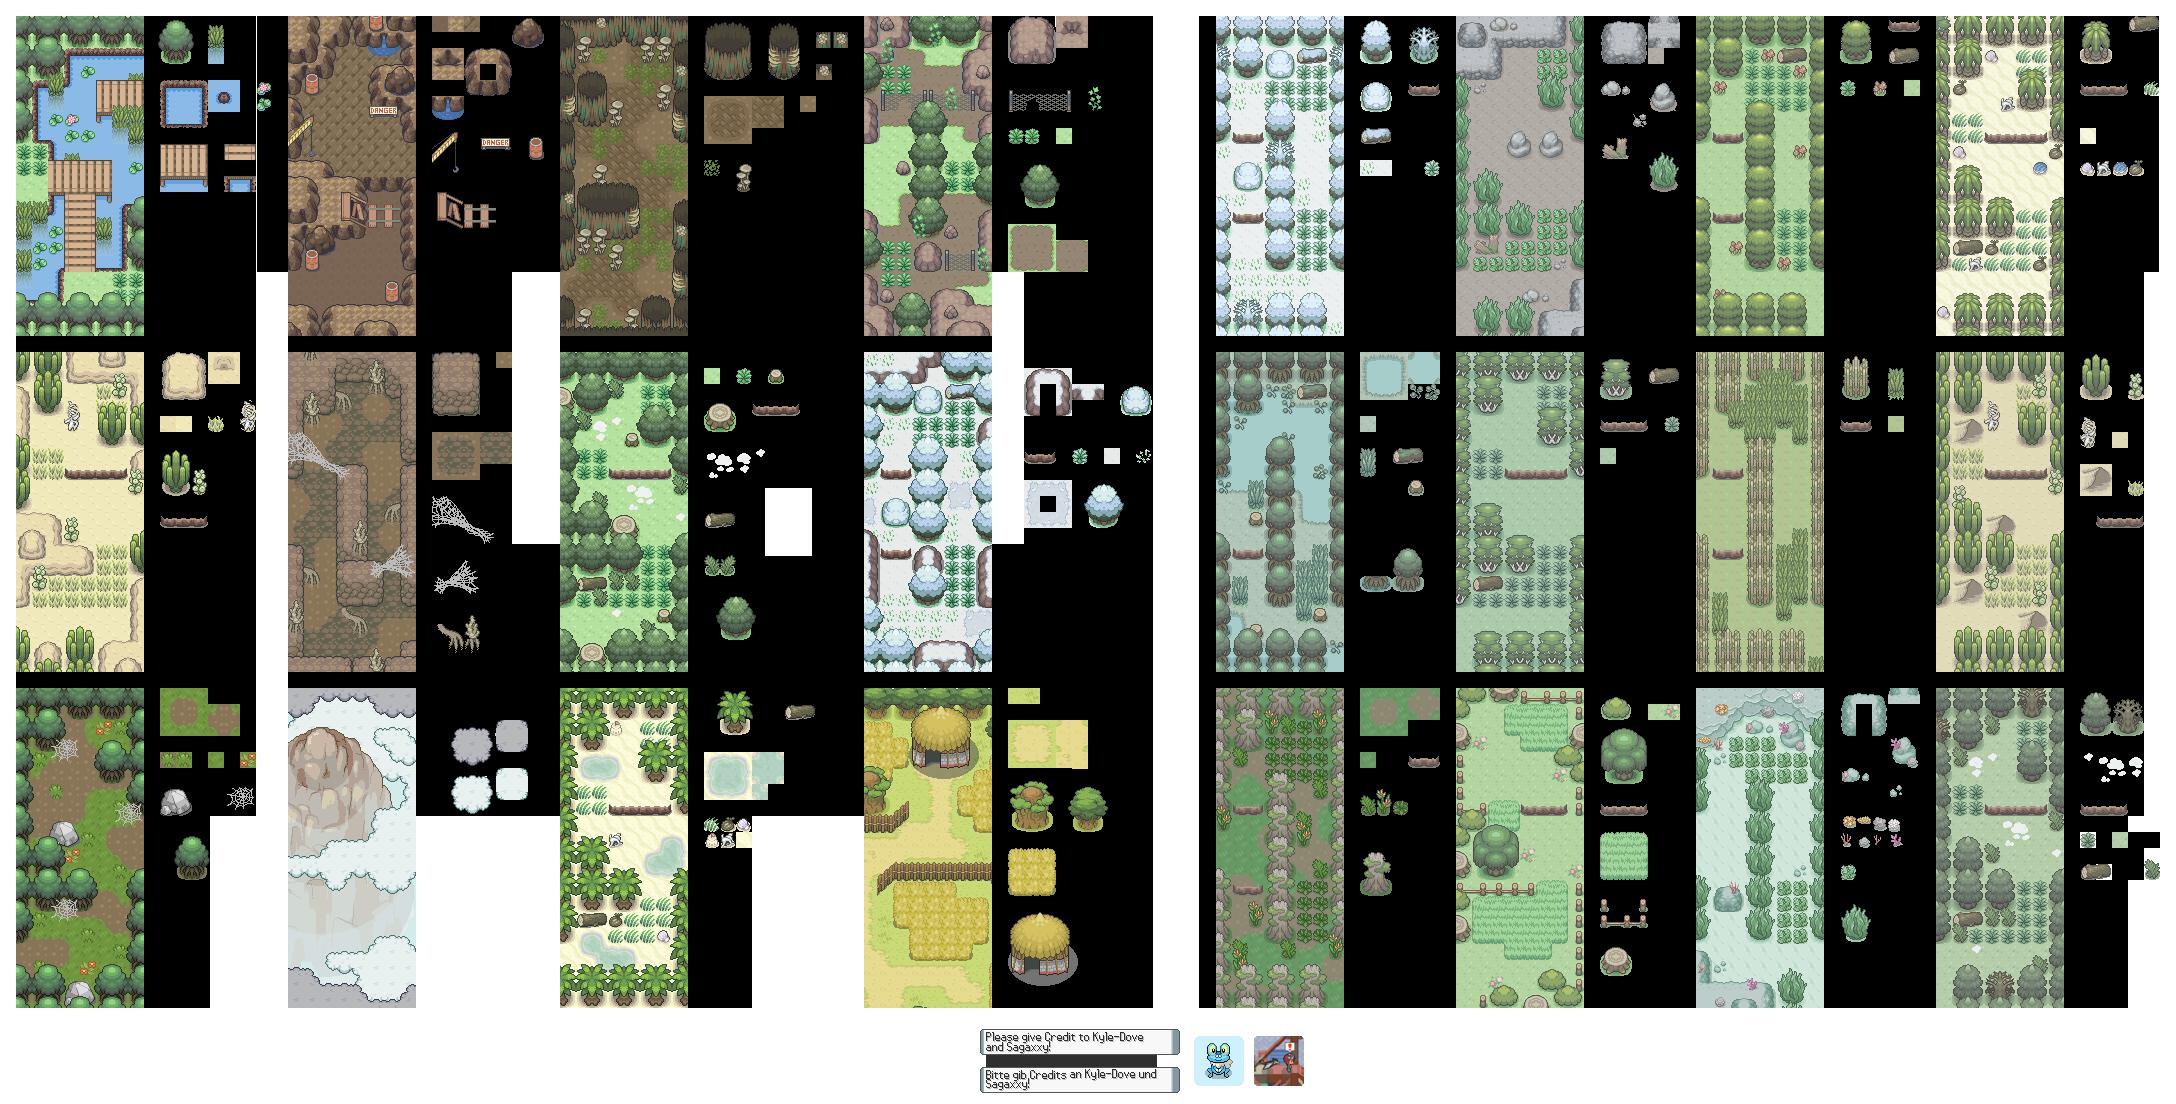 Pokémon-Tileset: Biome Tileset